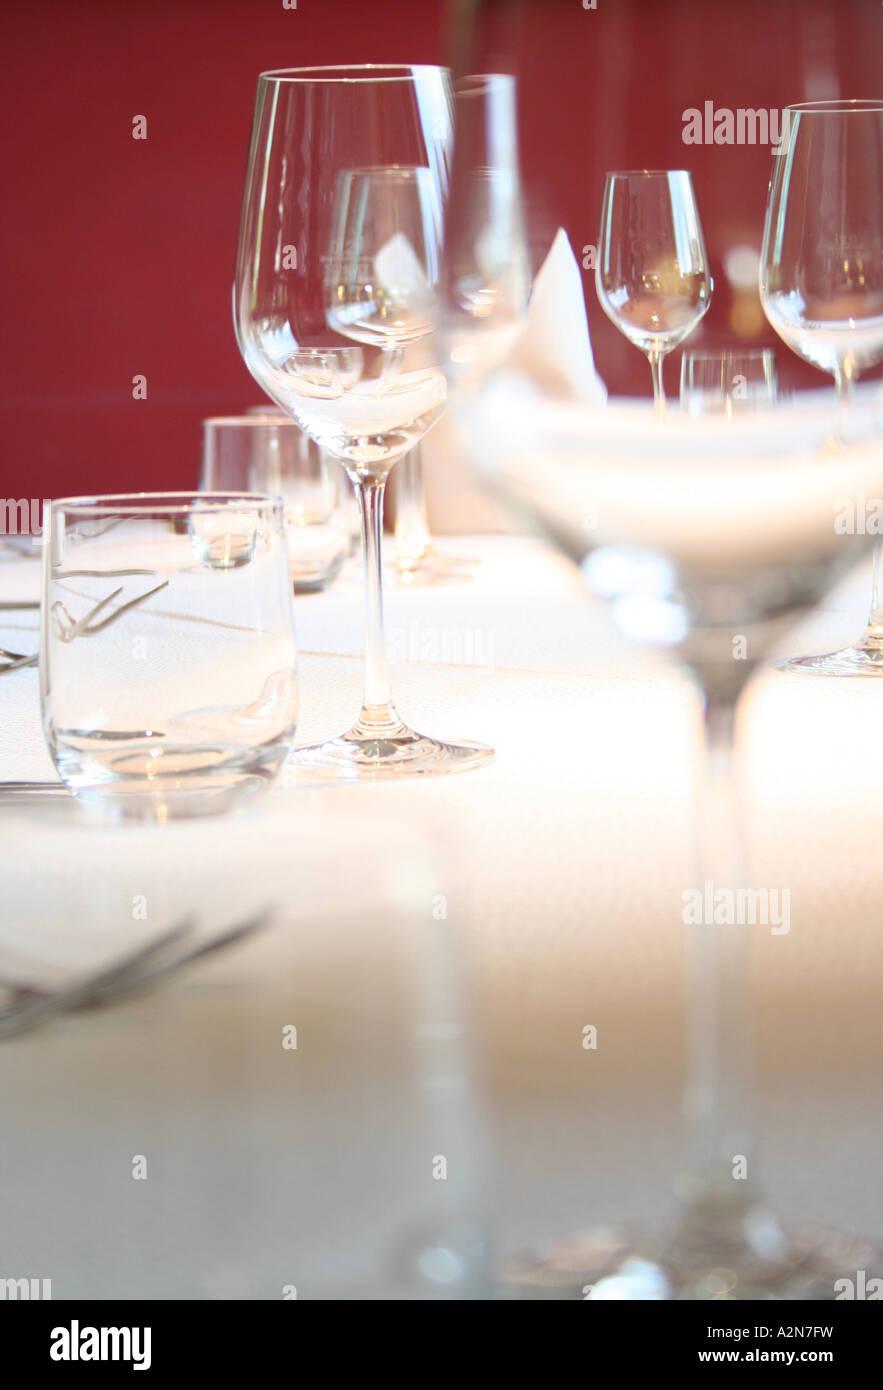 Stem glasses on table - Stock Image